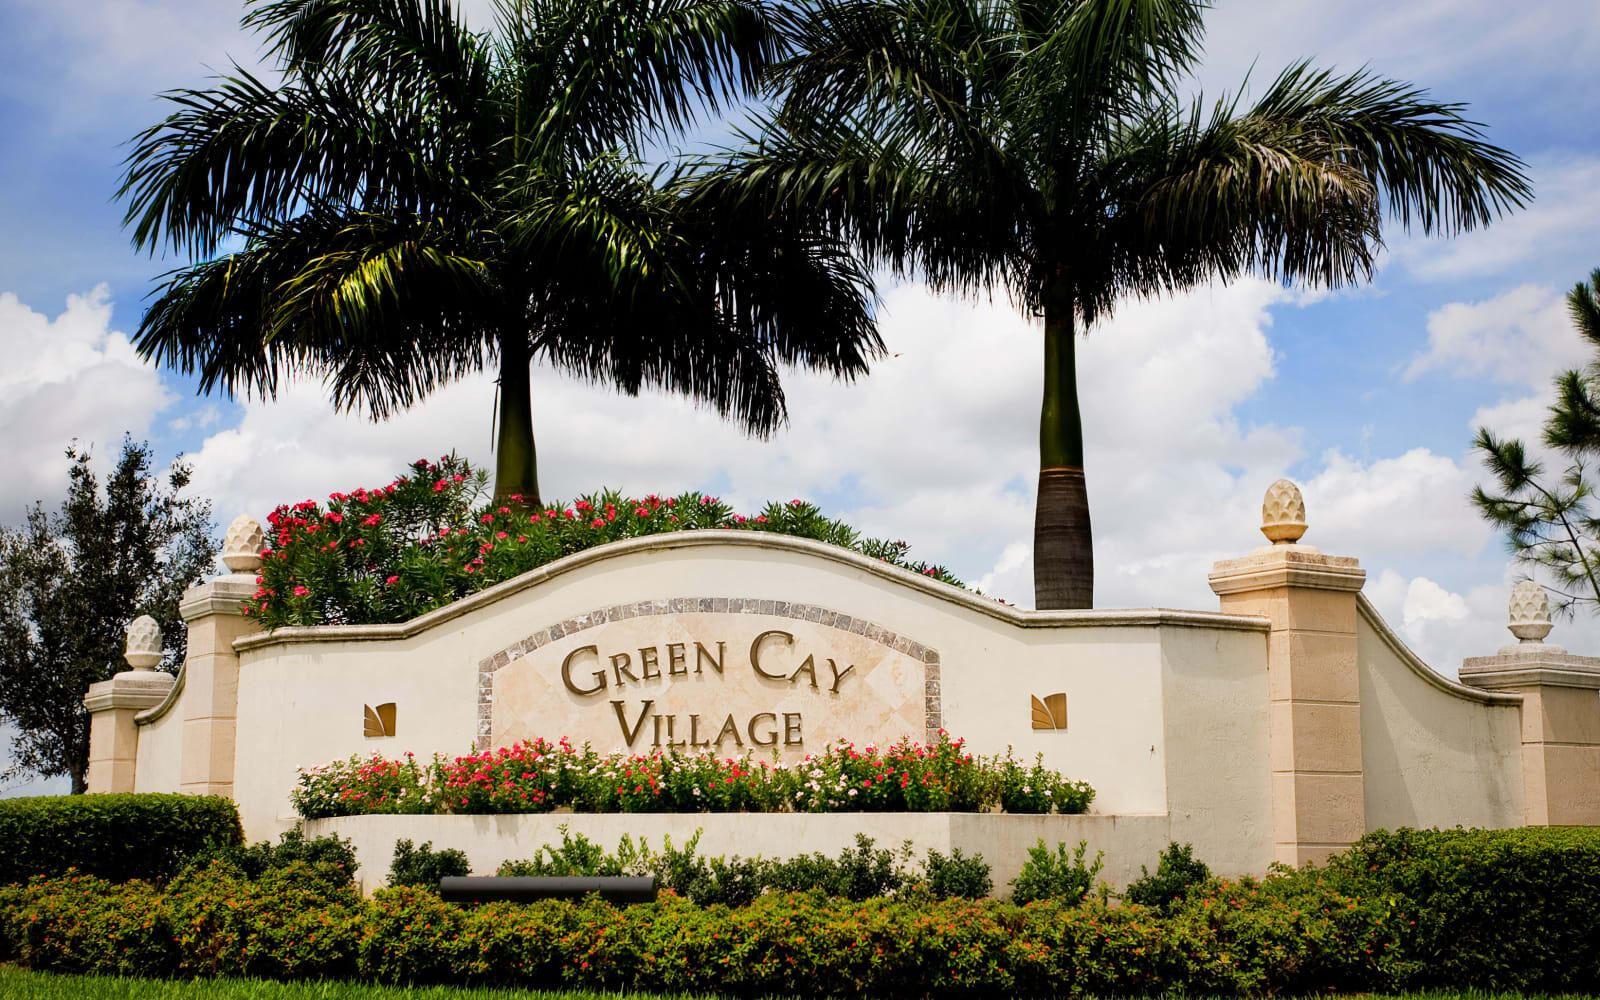 6760 Heritage Grande #6208, Boynton Beach, FL 33437 - #: RX-10706070